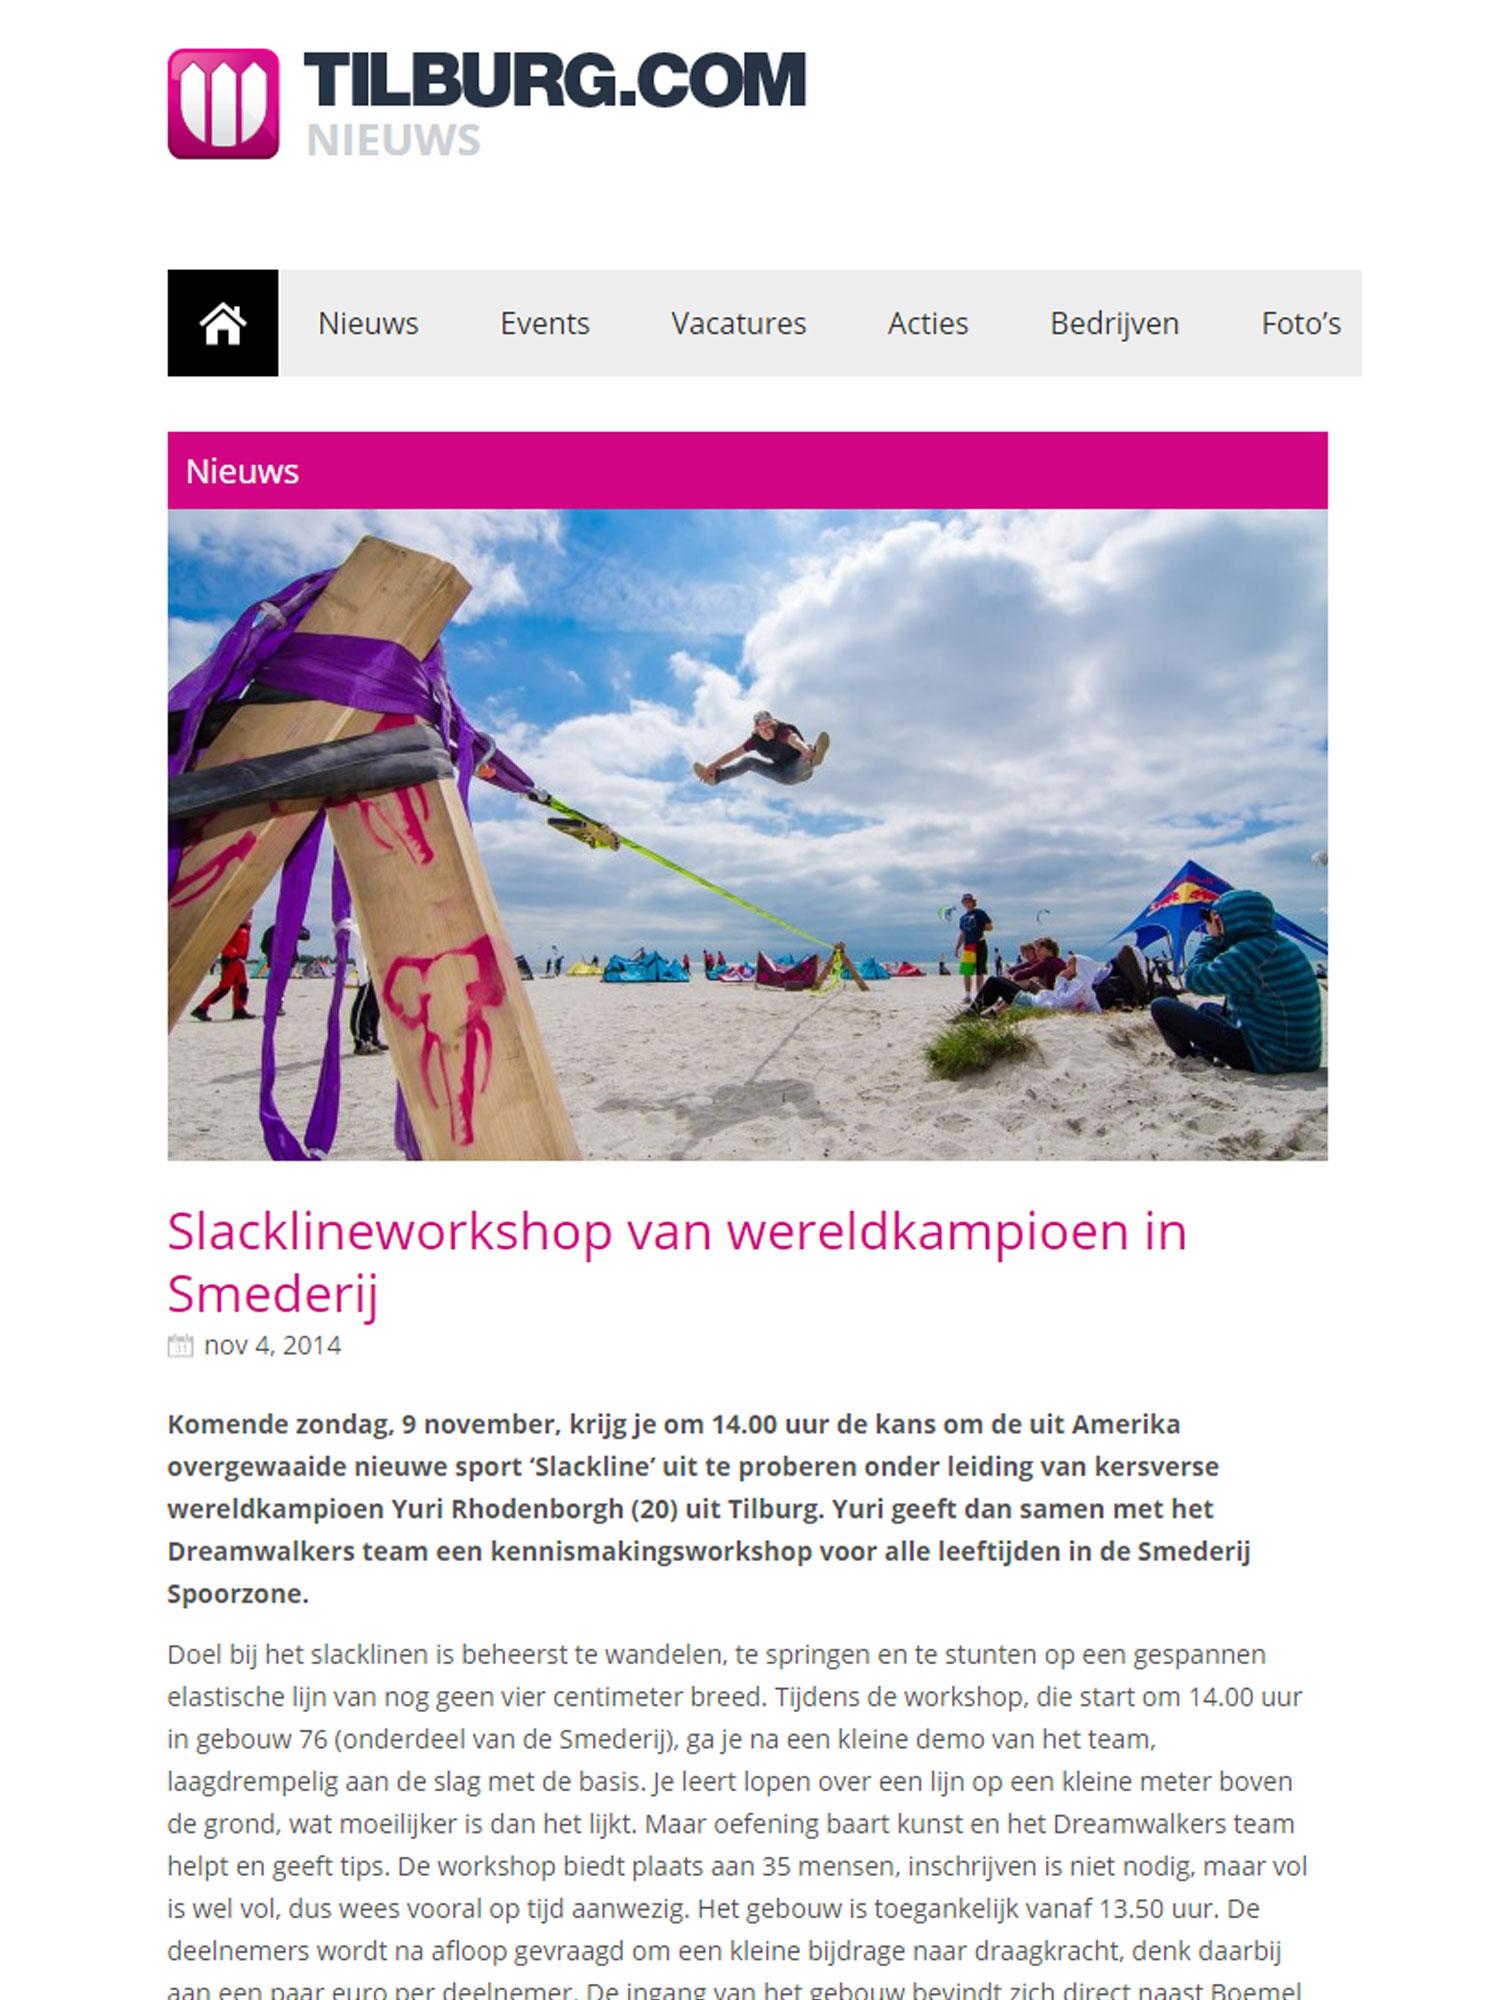 Tilburg-Nieuws-2000x1500px